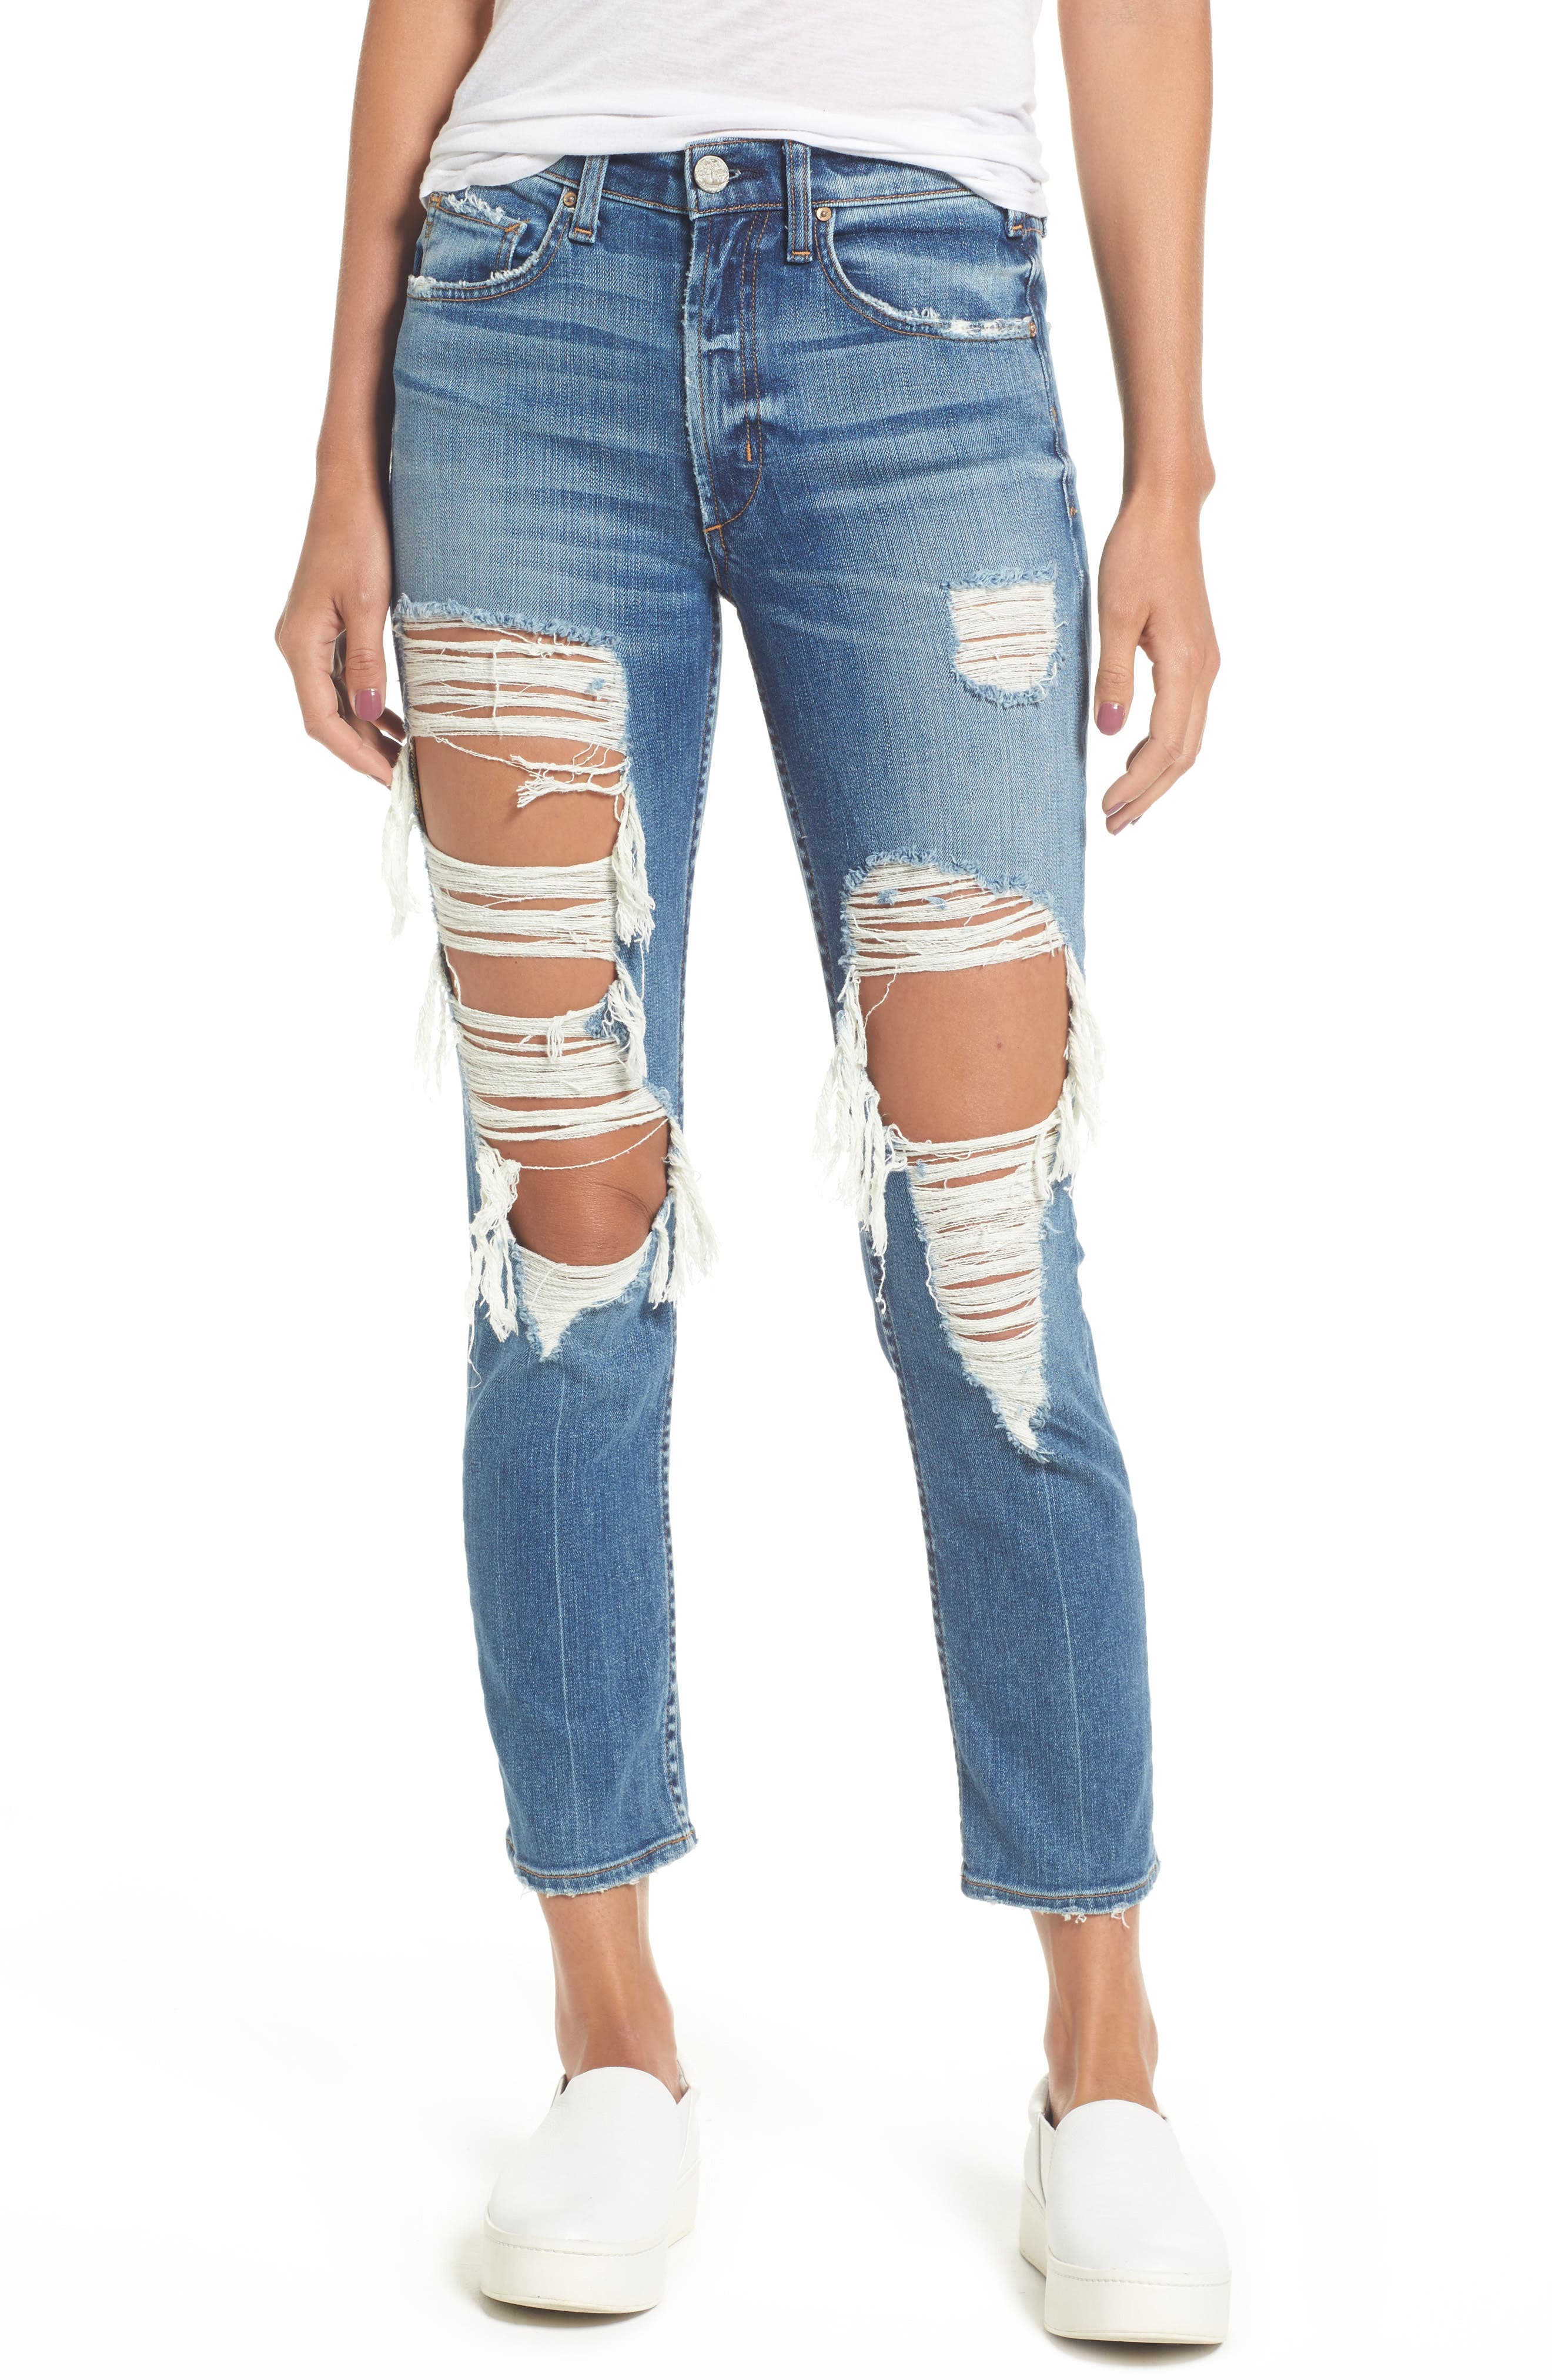 McGuire Windsor Destroyed High Waist Straight Leg Jeans